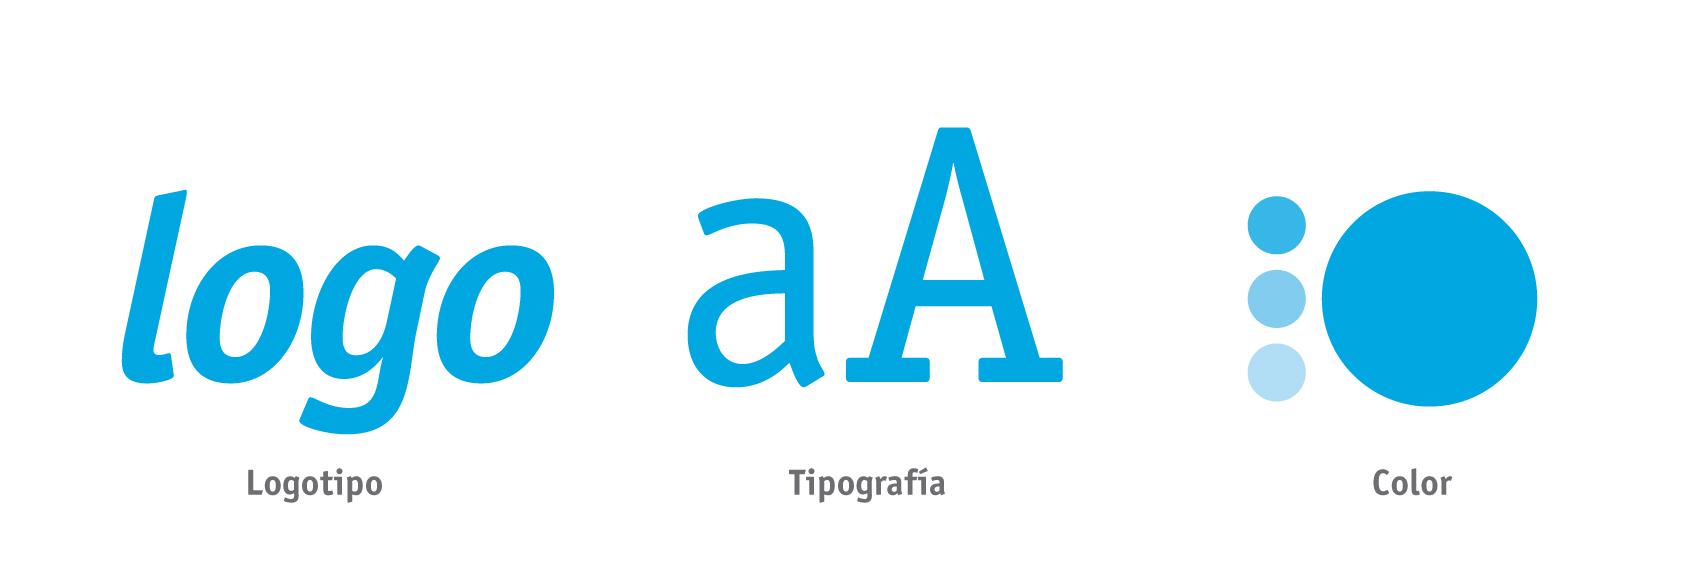 Nota blog lenguaje visual Kerigma (arte)-01.jpg